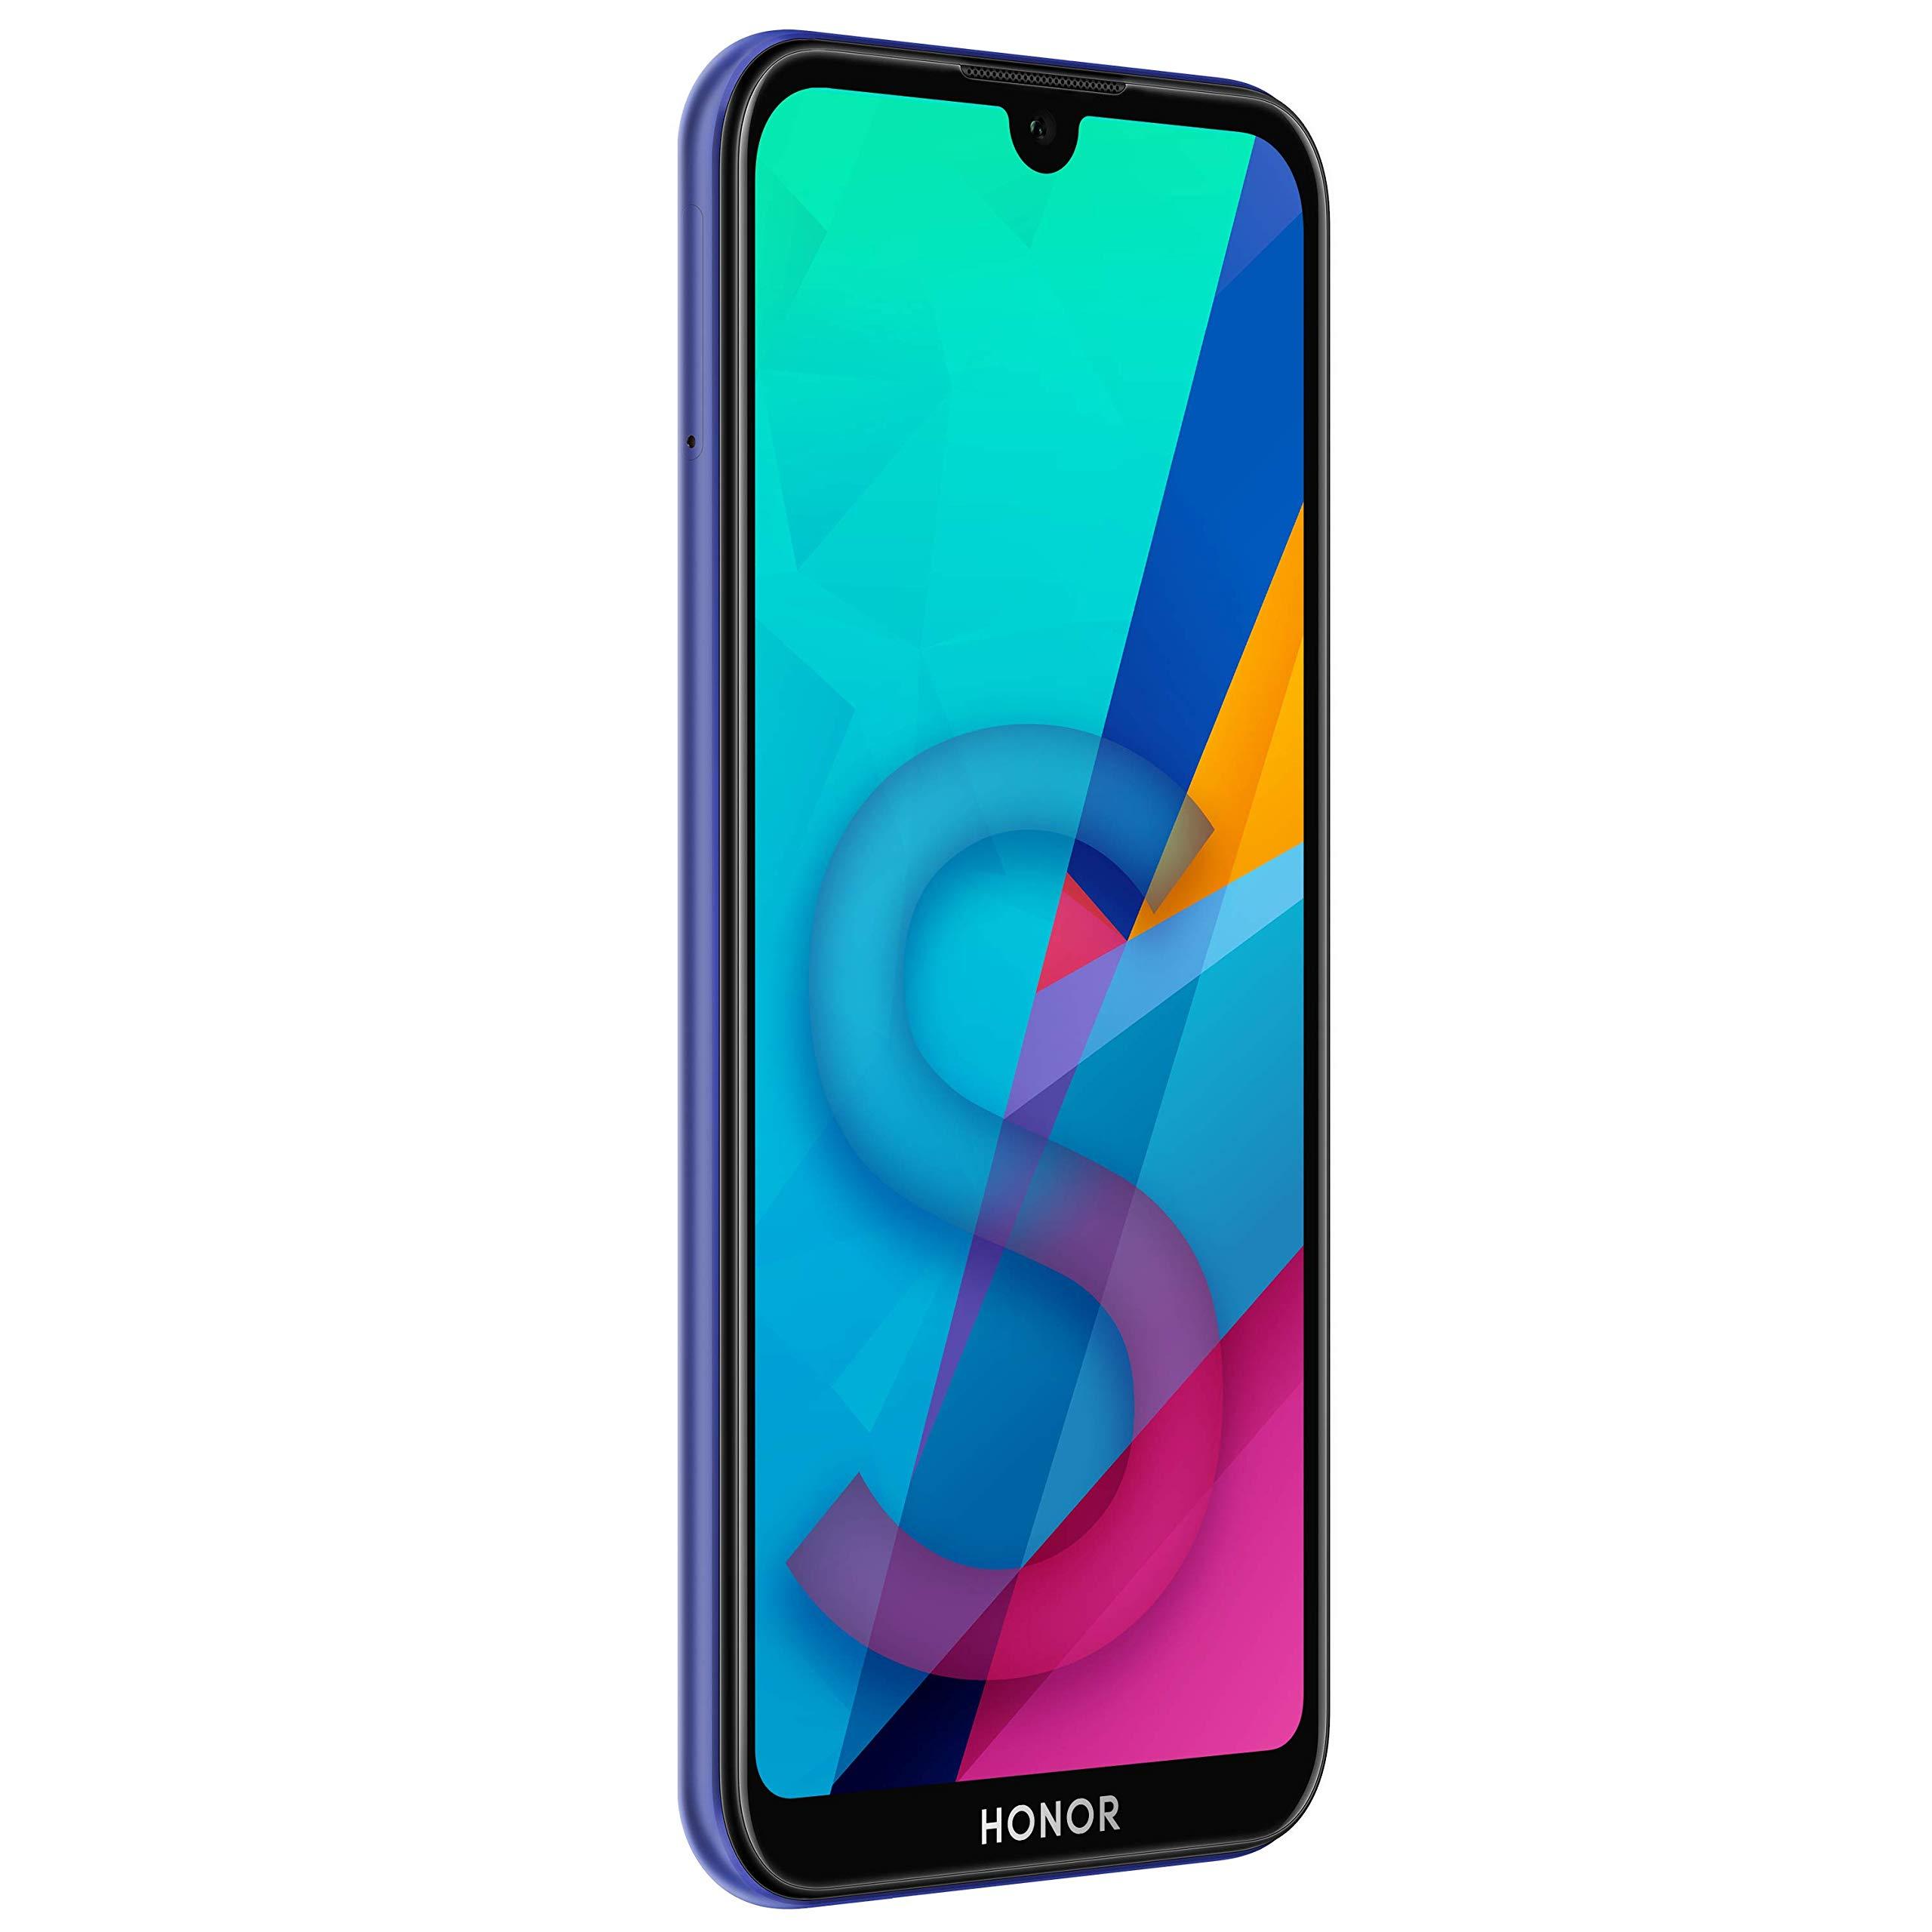 Honor 8S - Smartphone 32GB, 2GB RAM, Dual Sim, Blue: Amazon.es ...